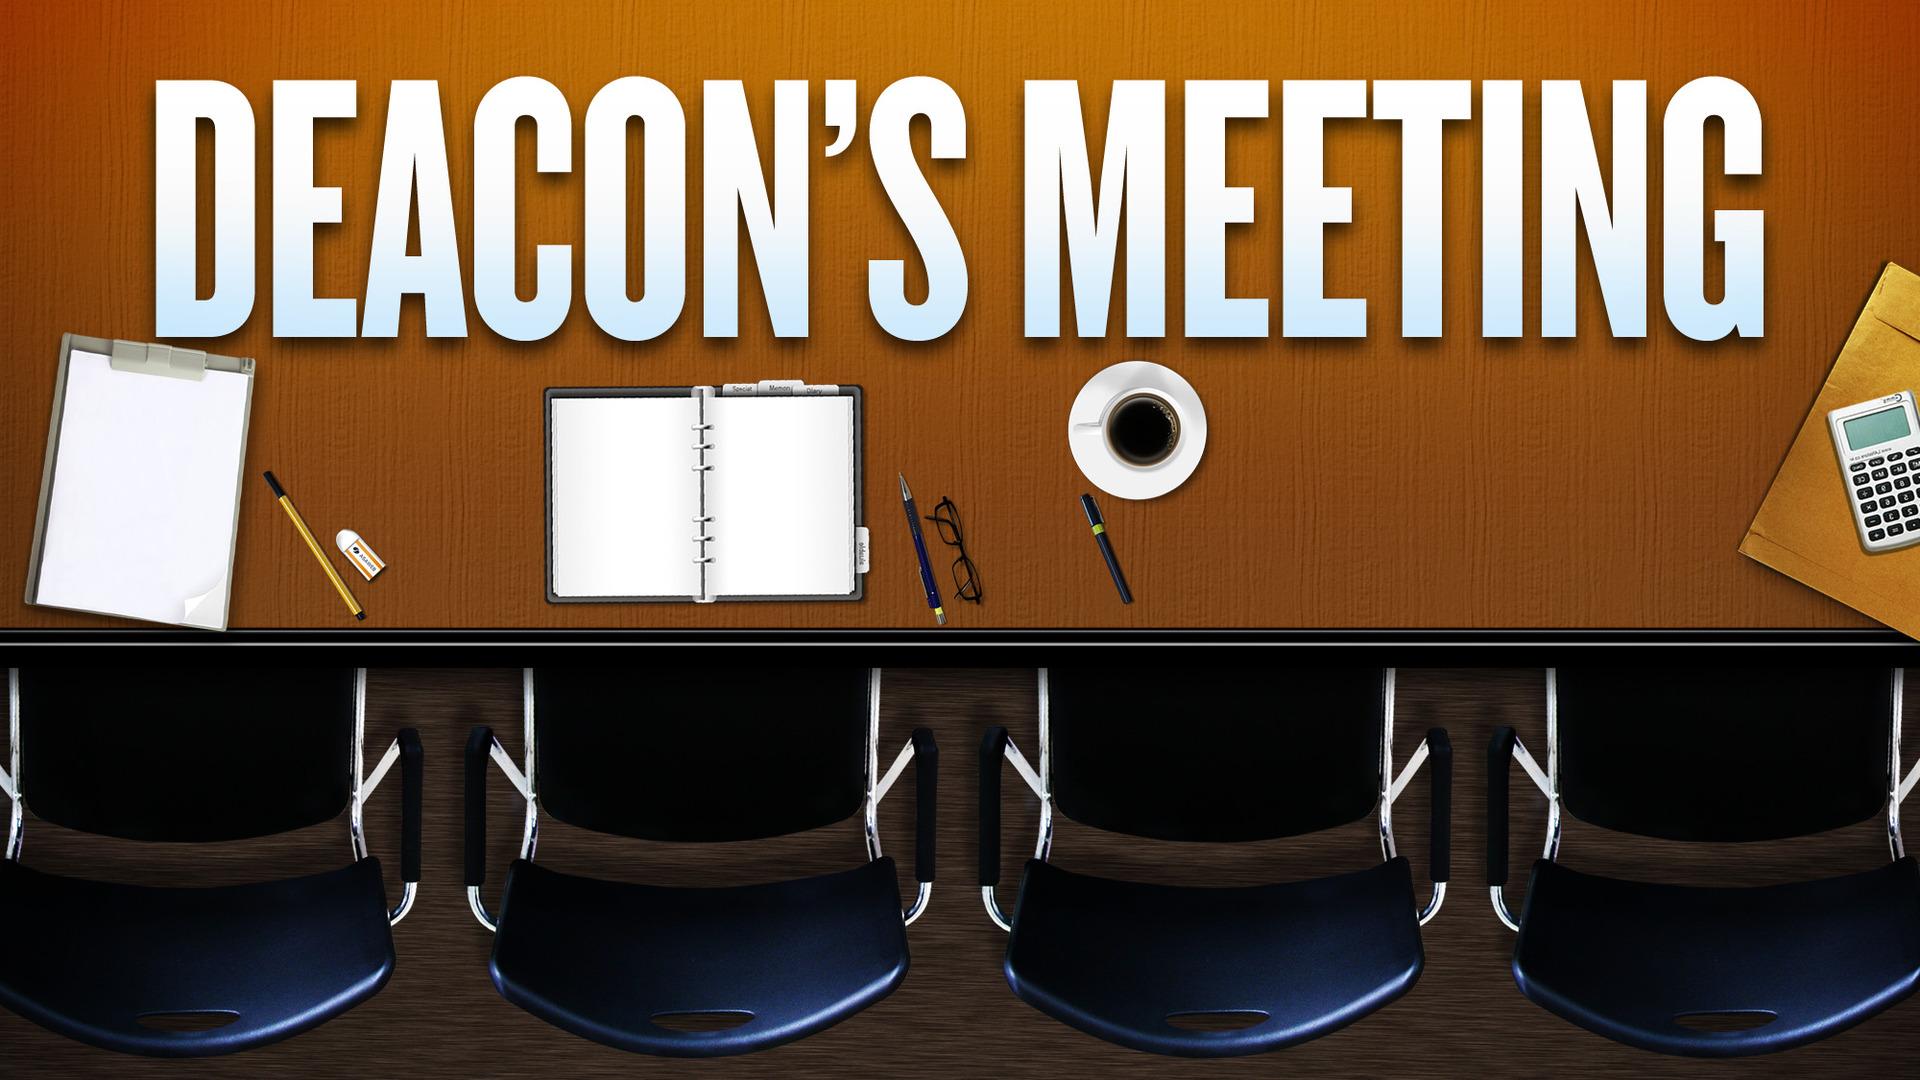 deacon_s_meeting-title-2-still-16x9.jpg